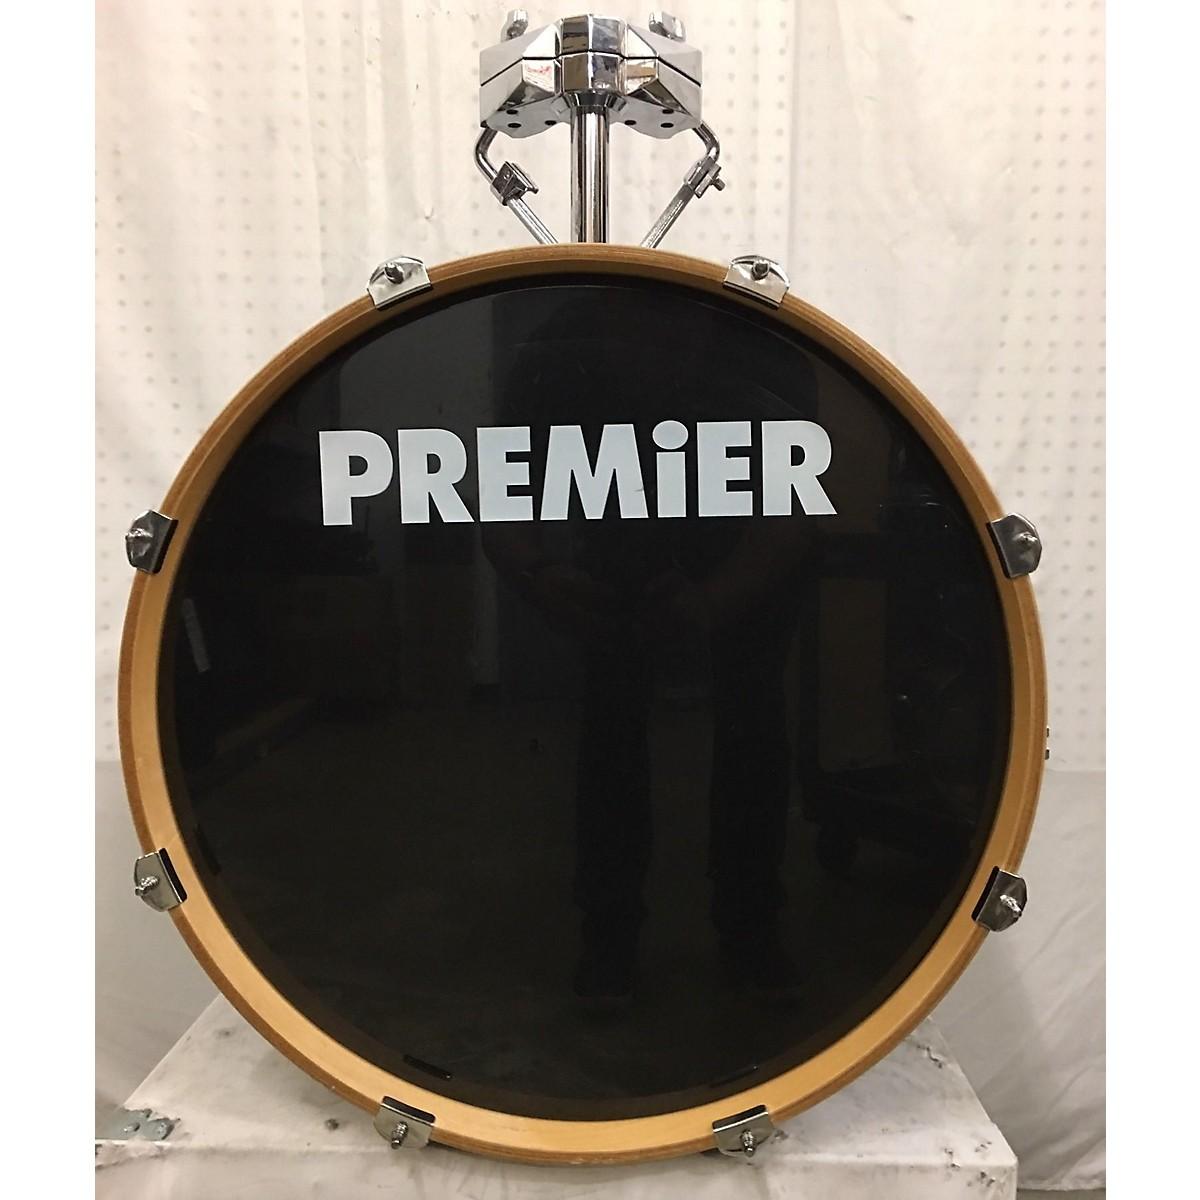 Premier 1990s Projector Series Drum Kit